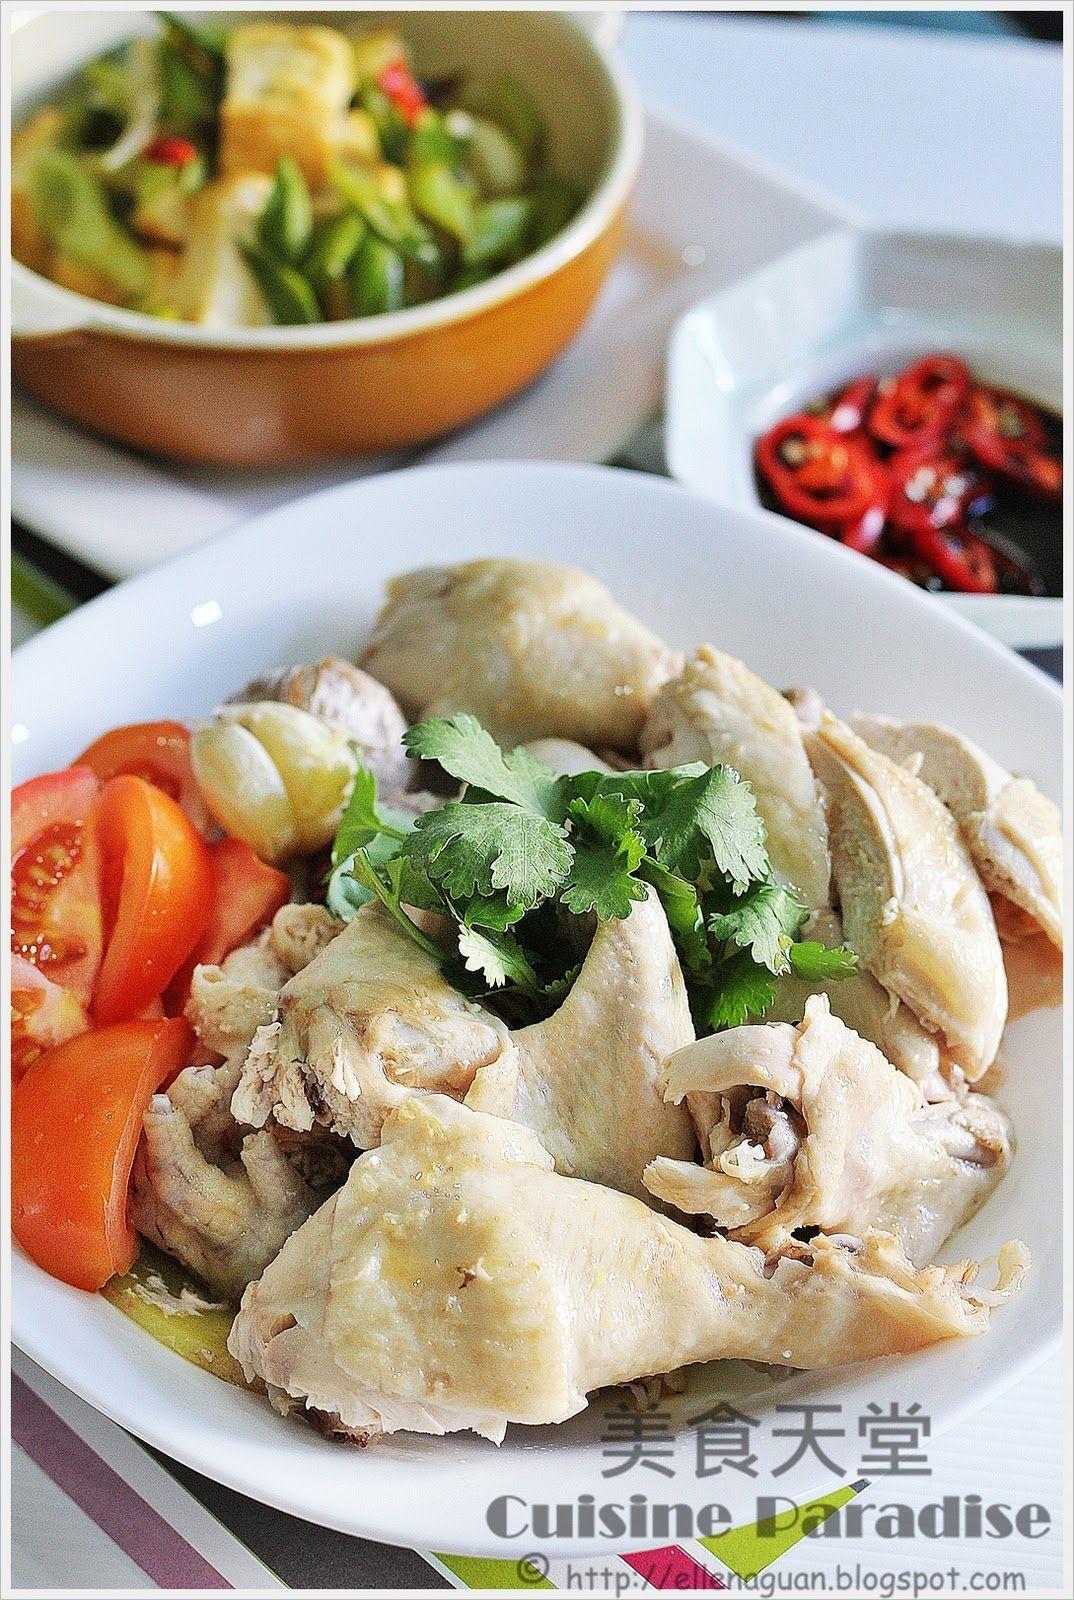 Cuisine Paradise Singapore Food Blog Recipes Food